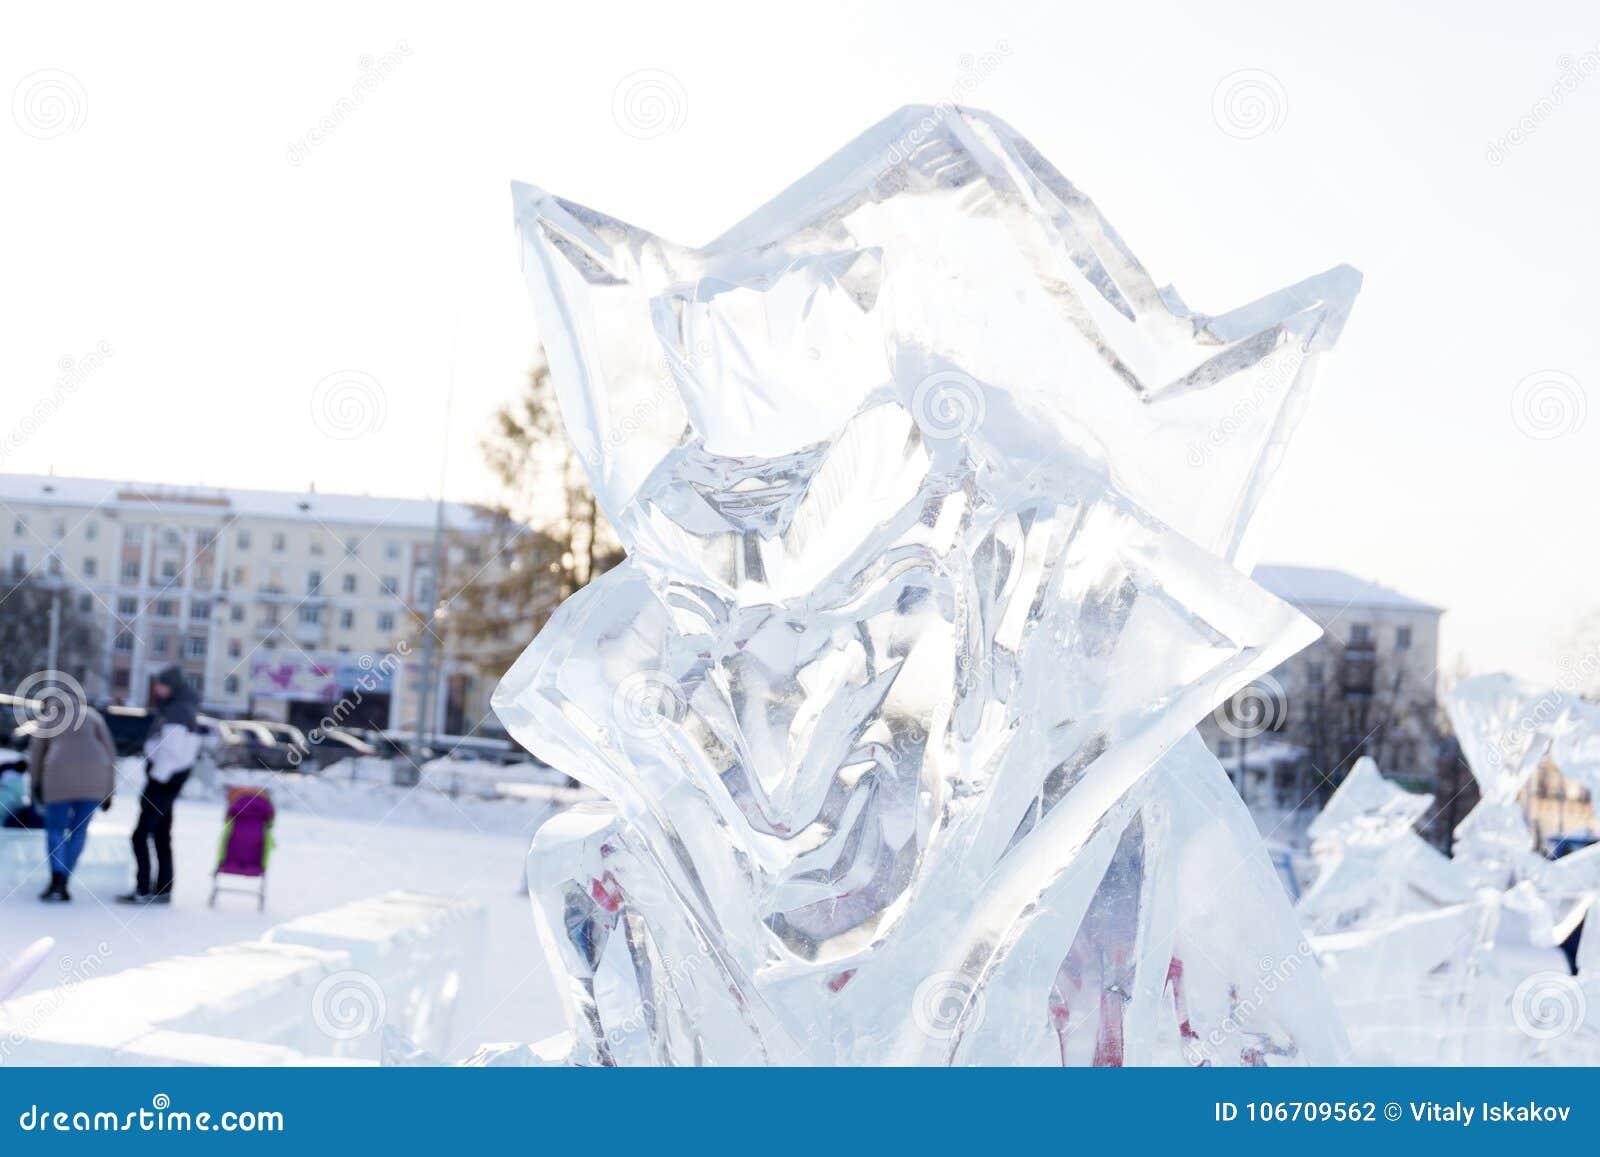 Christmas Ice Sculptures Grandmother Yagi Editorial Photography ...